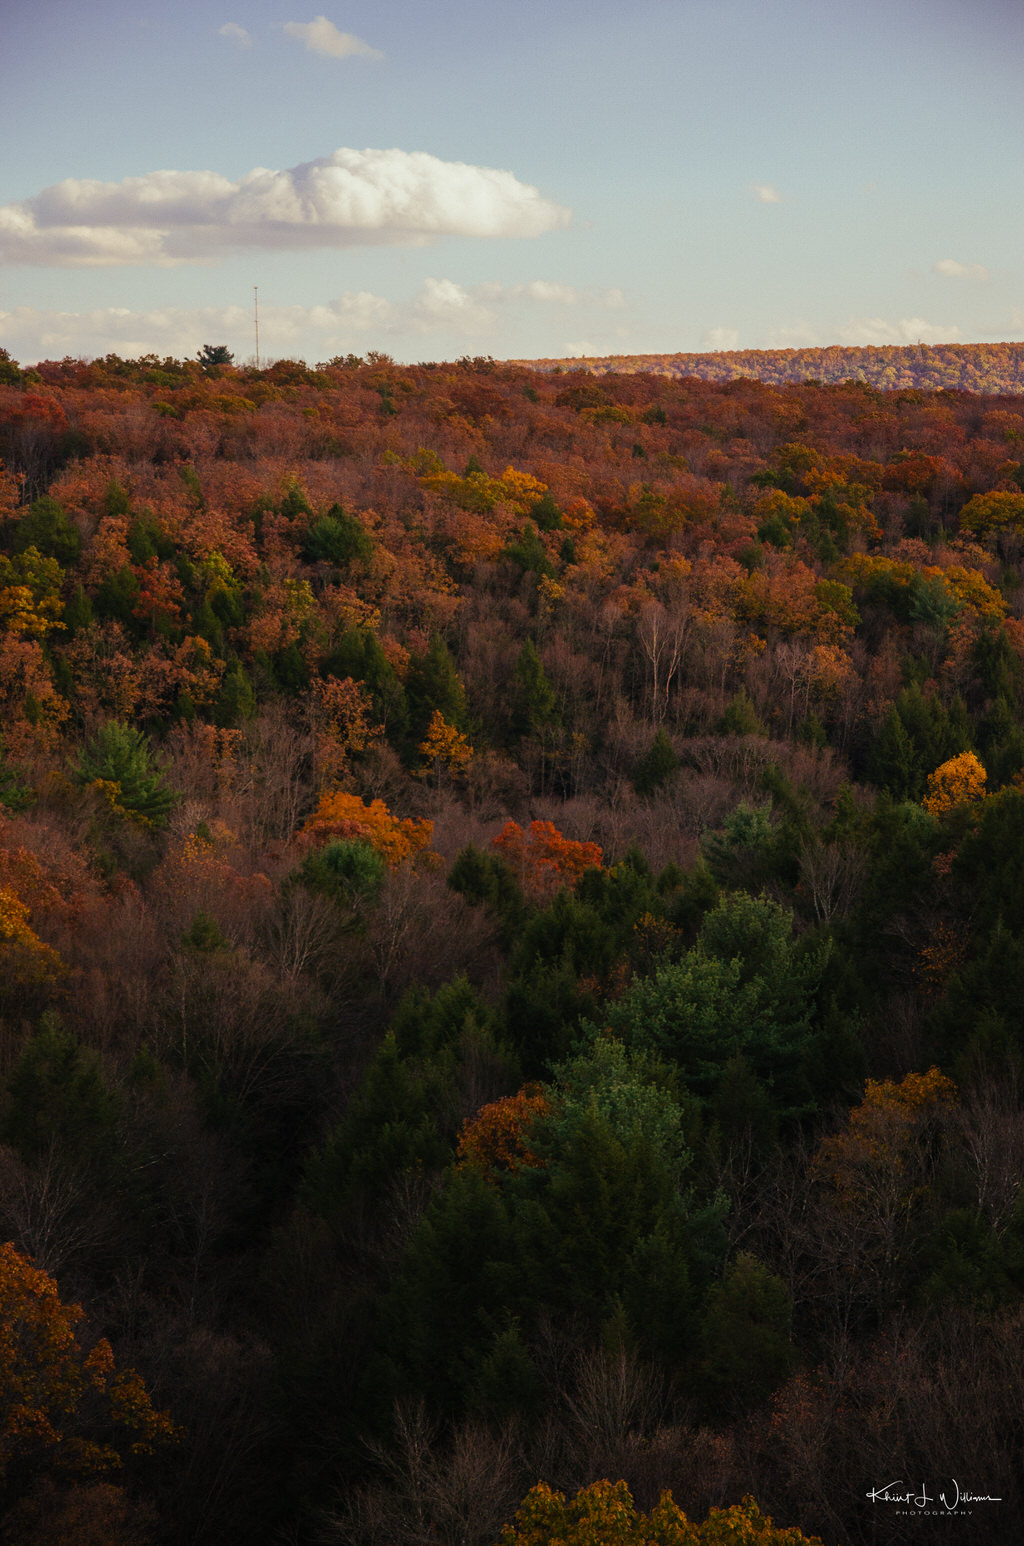 Autumn Leaf Excursion to Jim Thorpe on the Lehigh Gorge Scenic Railway Lehigh Gorge Railway Jim Thorpe Autum Leaf Excursion NIKON D5100 20161023 5221 1